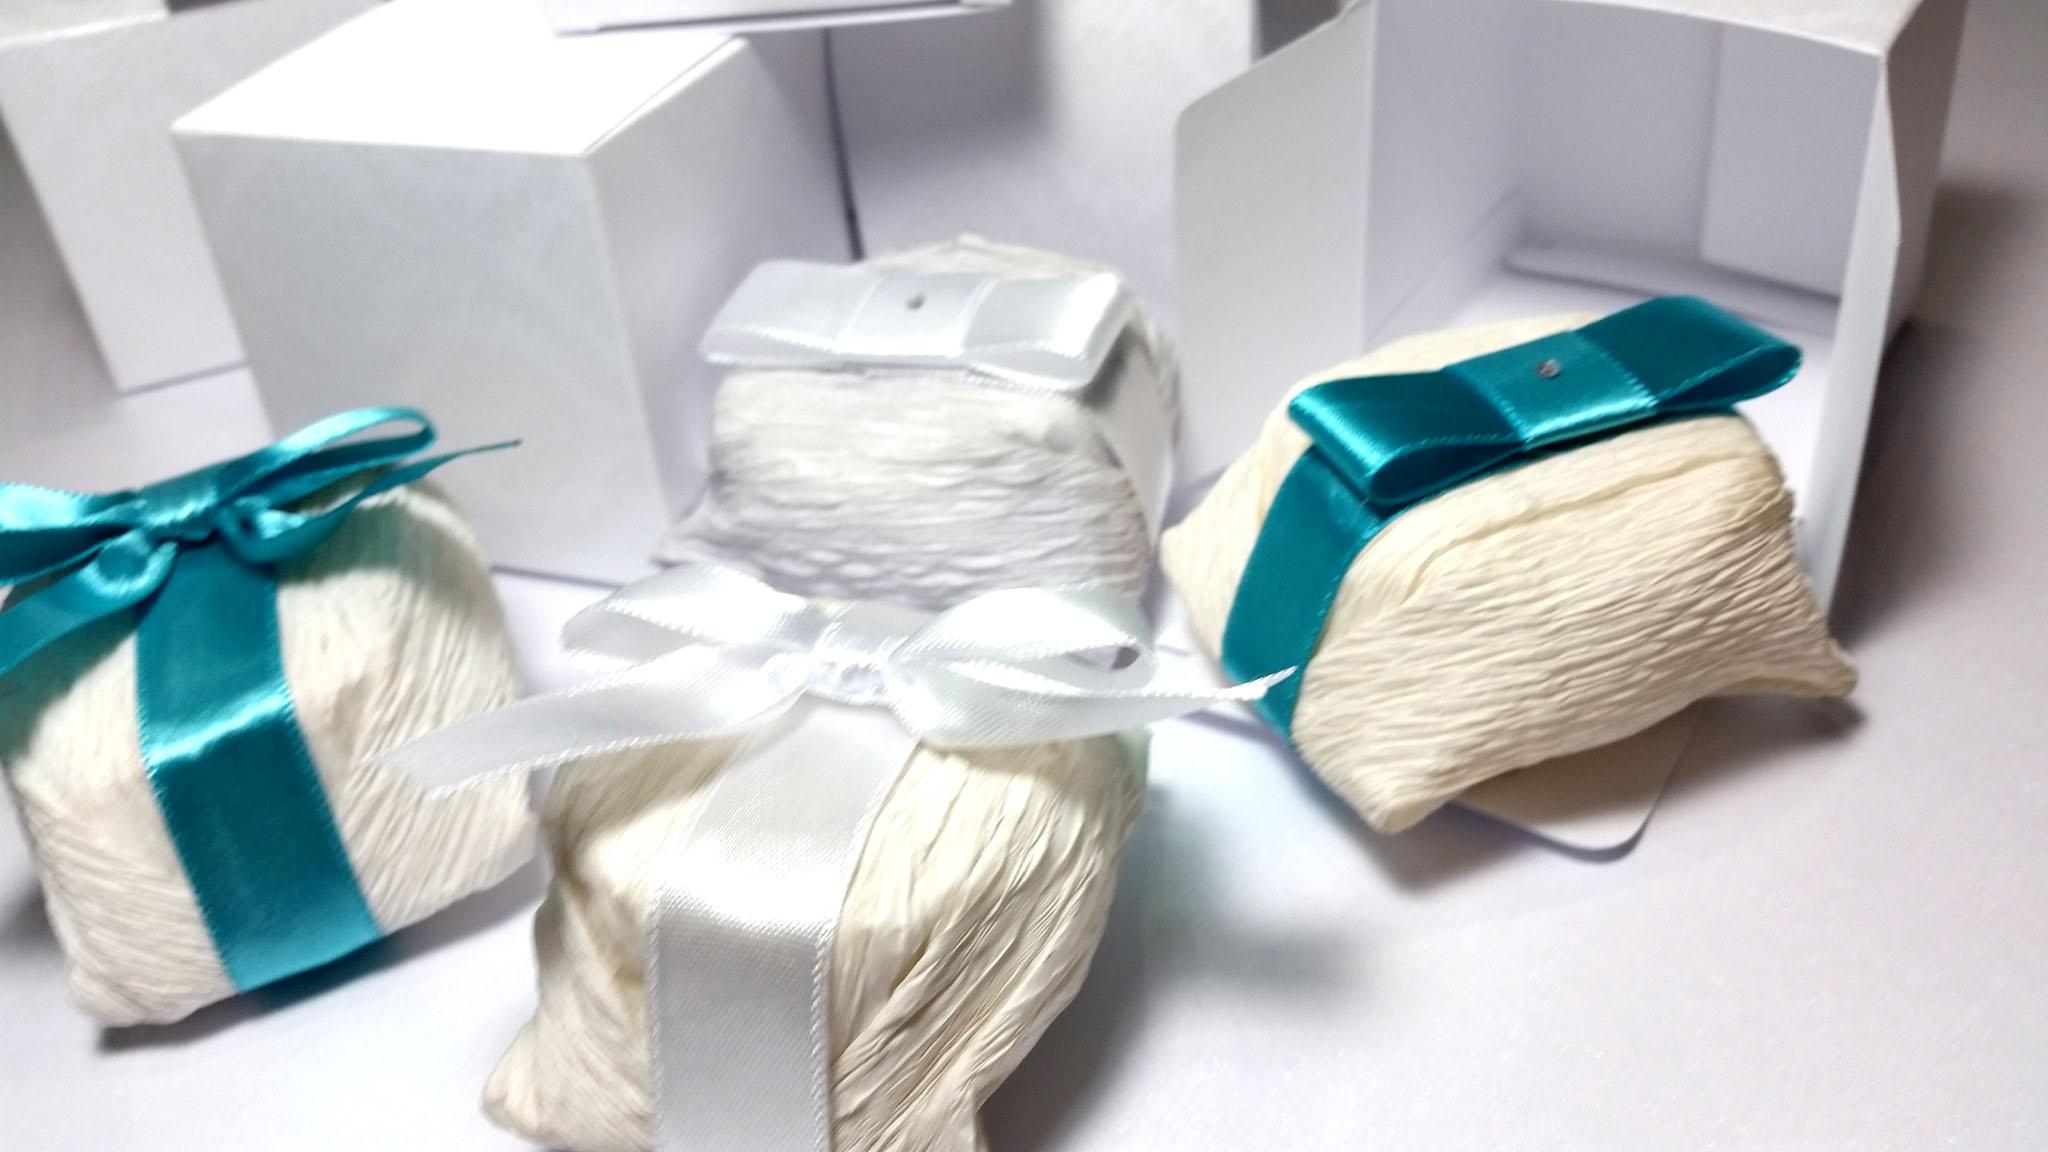 REF 0895 - Embalagem Bem Casado